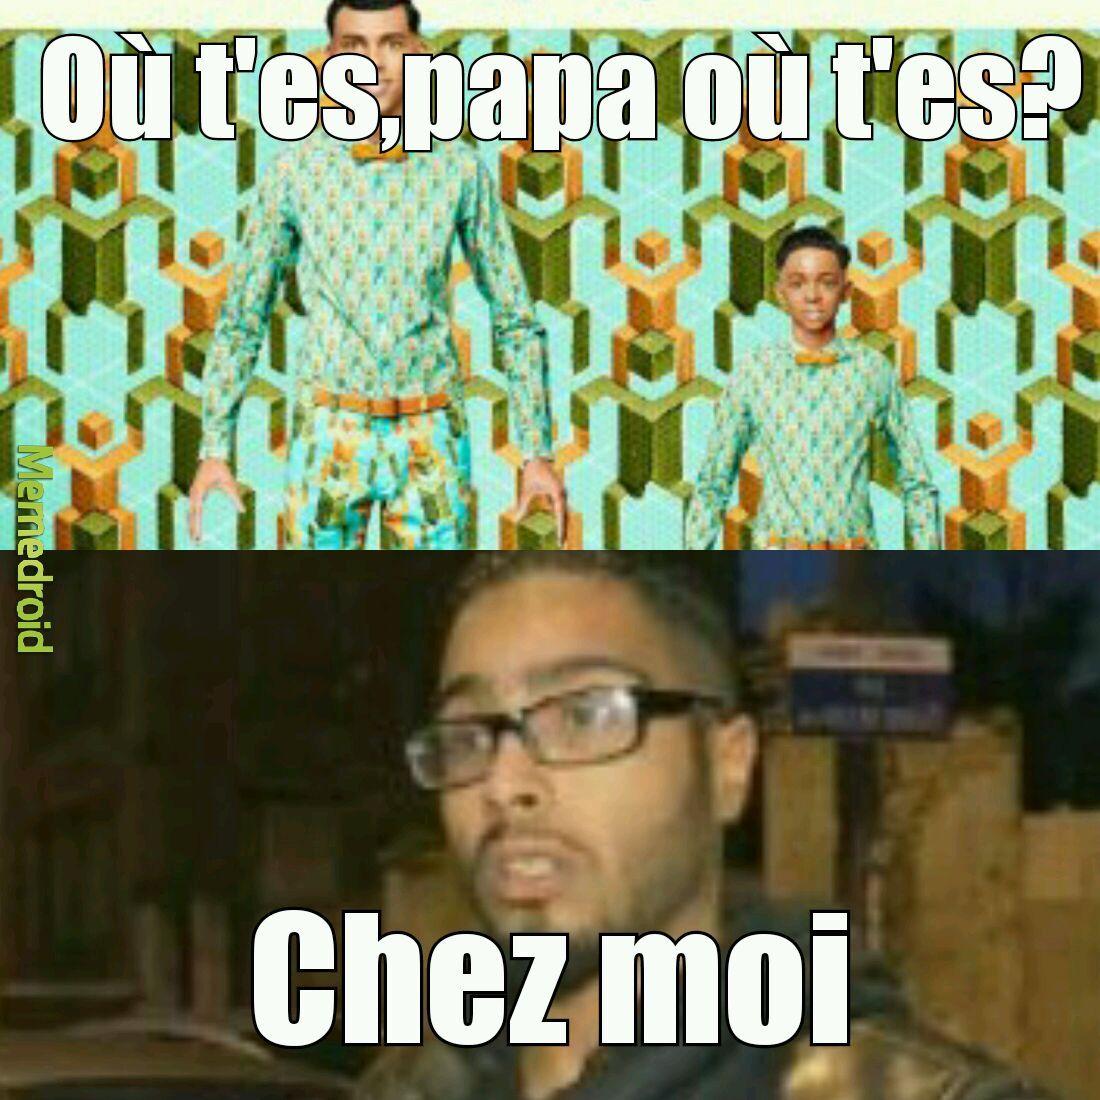 Jawad ahahaha - meme